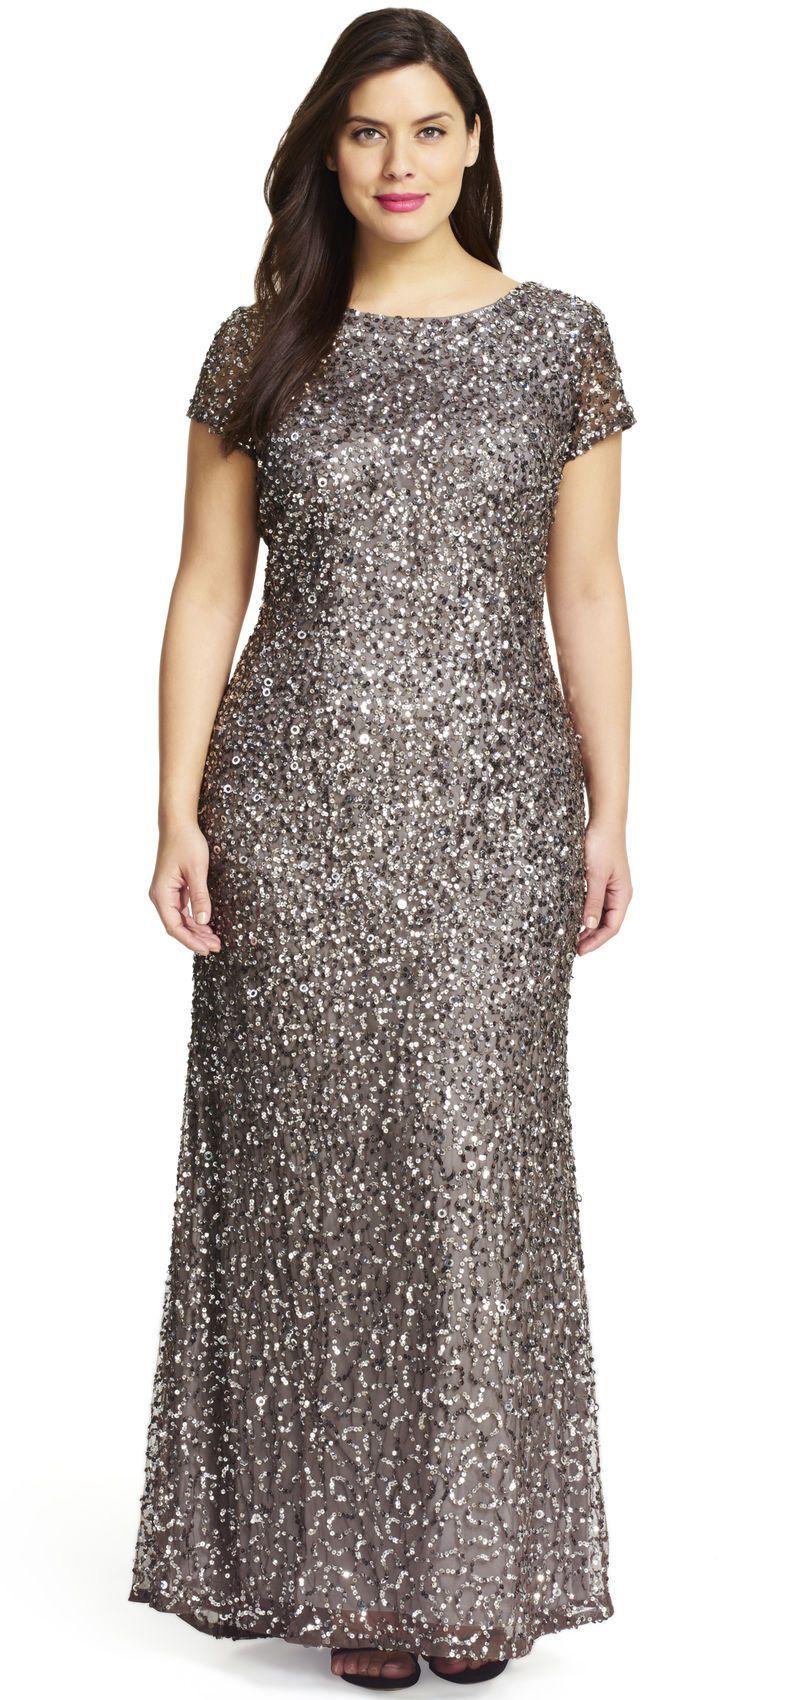 Scoop Back Sequin Gown Plus Size